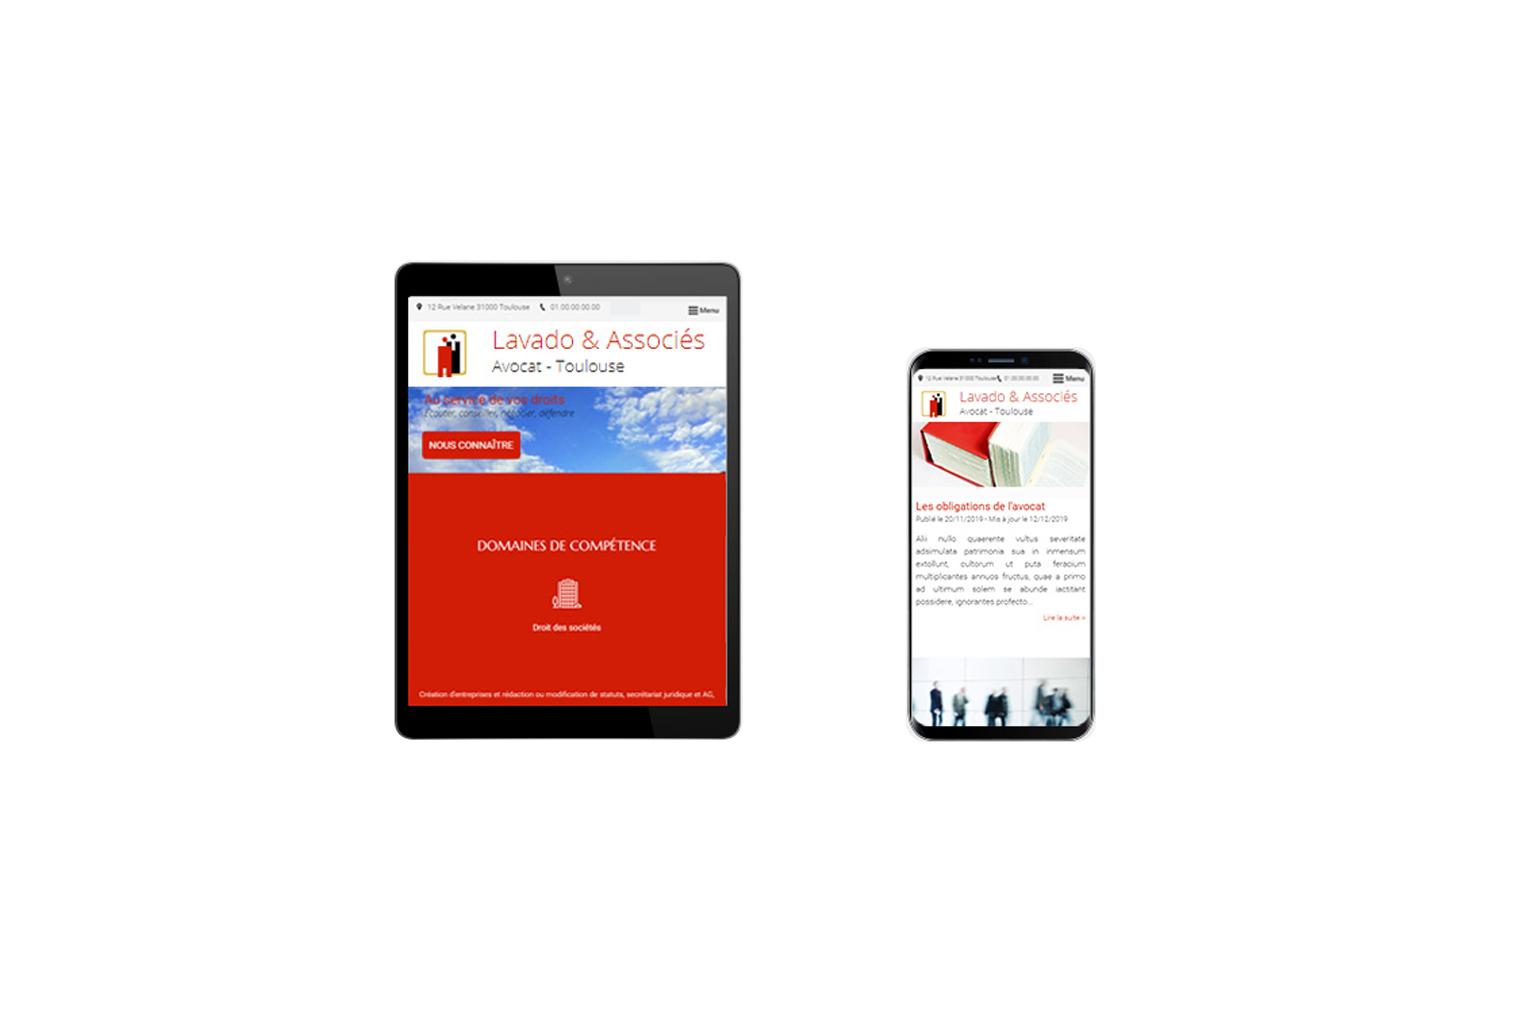 workdigital-fonction-accessibilite-tablette-mobile